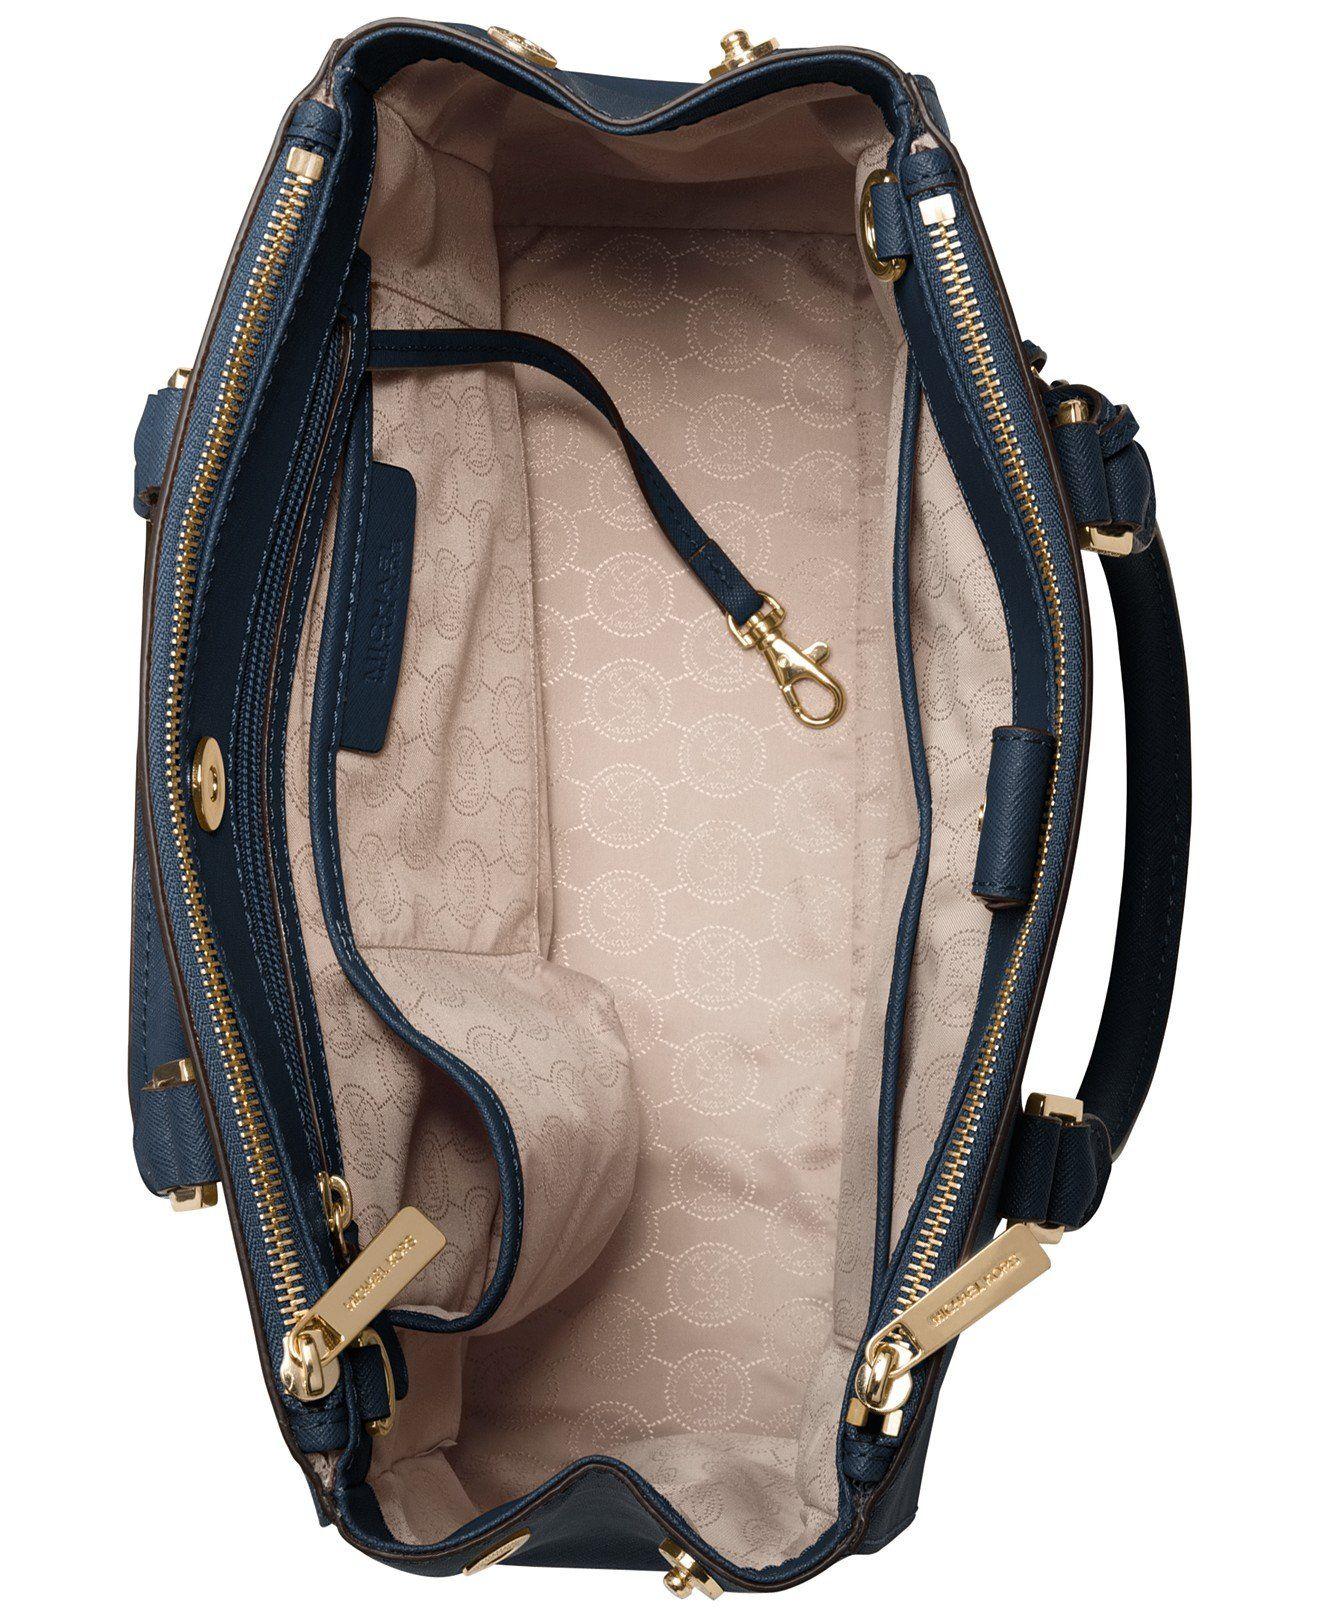 Michael Kors Sutton Medium Satchel Electric Blue/Gold: Handbags: Amazon.com